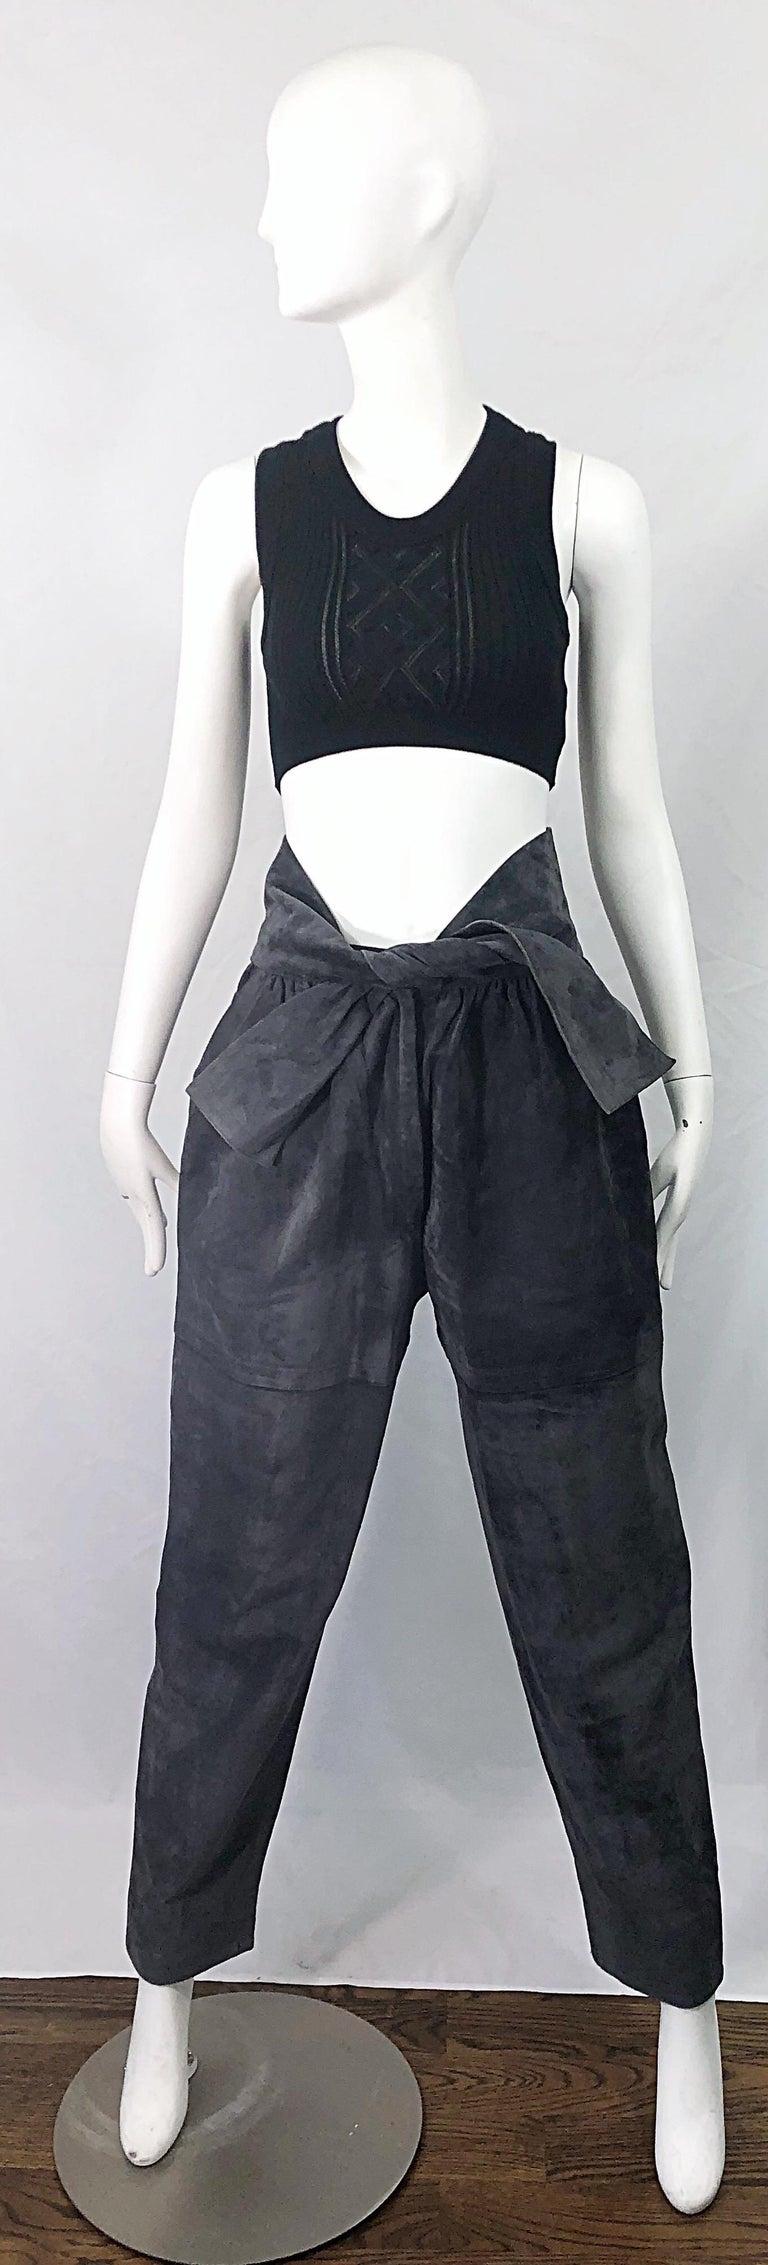 Vintage Yves Saint Laurent YSL 1980s Grey Suede Leather High Waisted Harem Pants For Sale 10